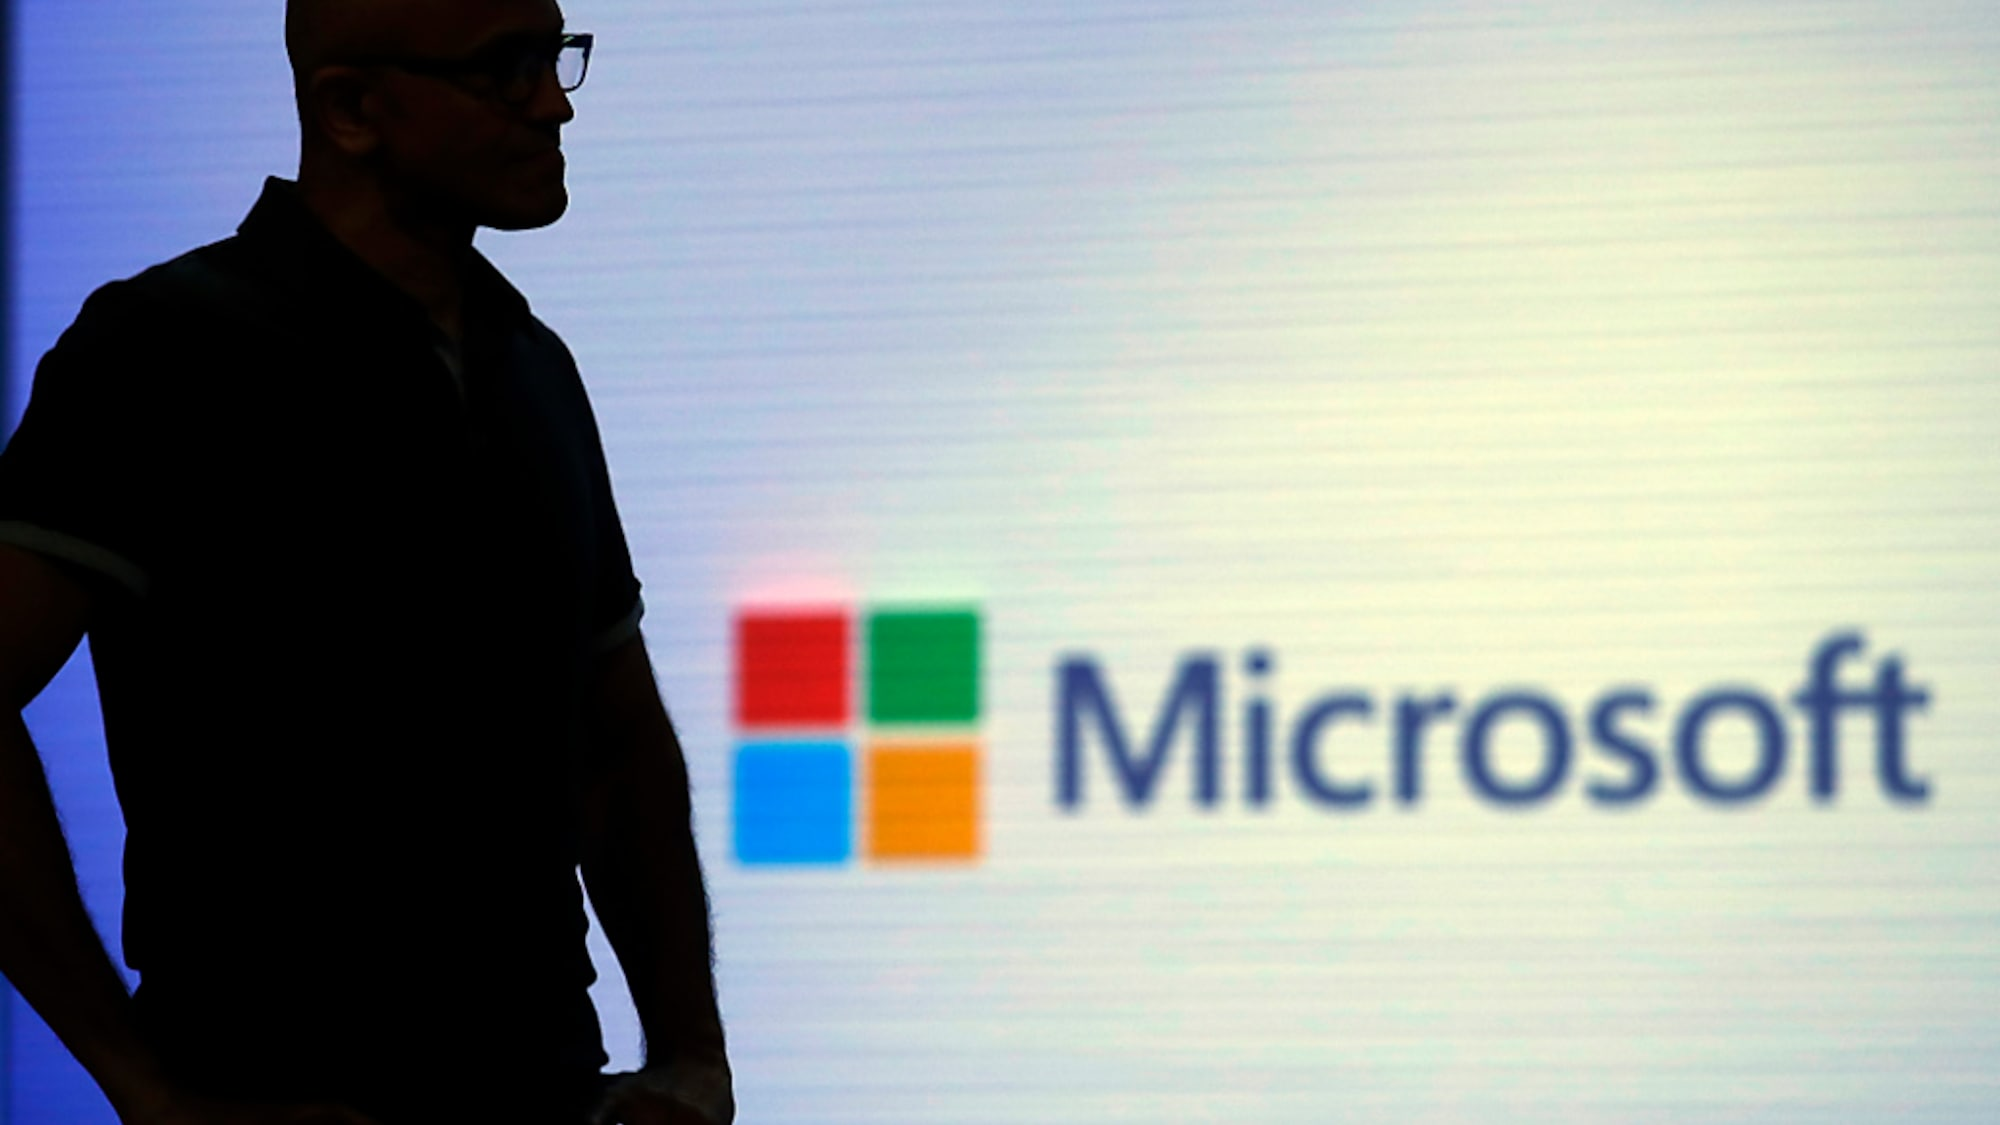 Informationstechnologie: Microsoft steigert Umsatz und Gewinn dank Cloud-Geschäften